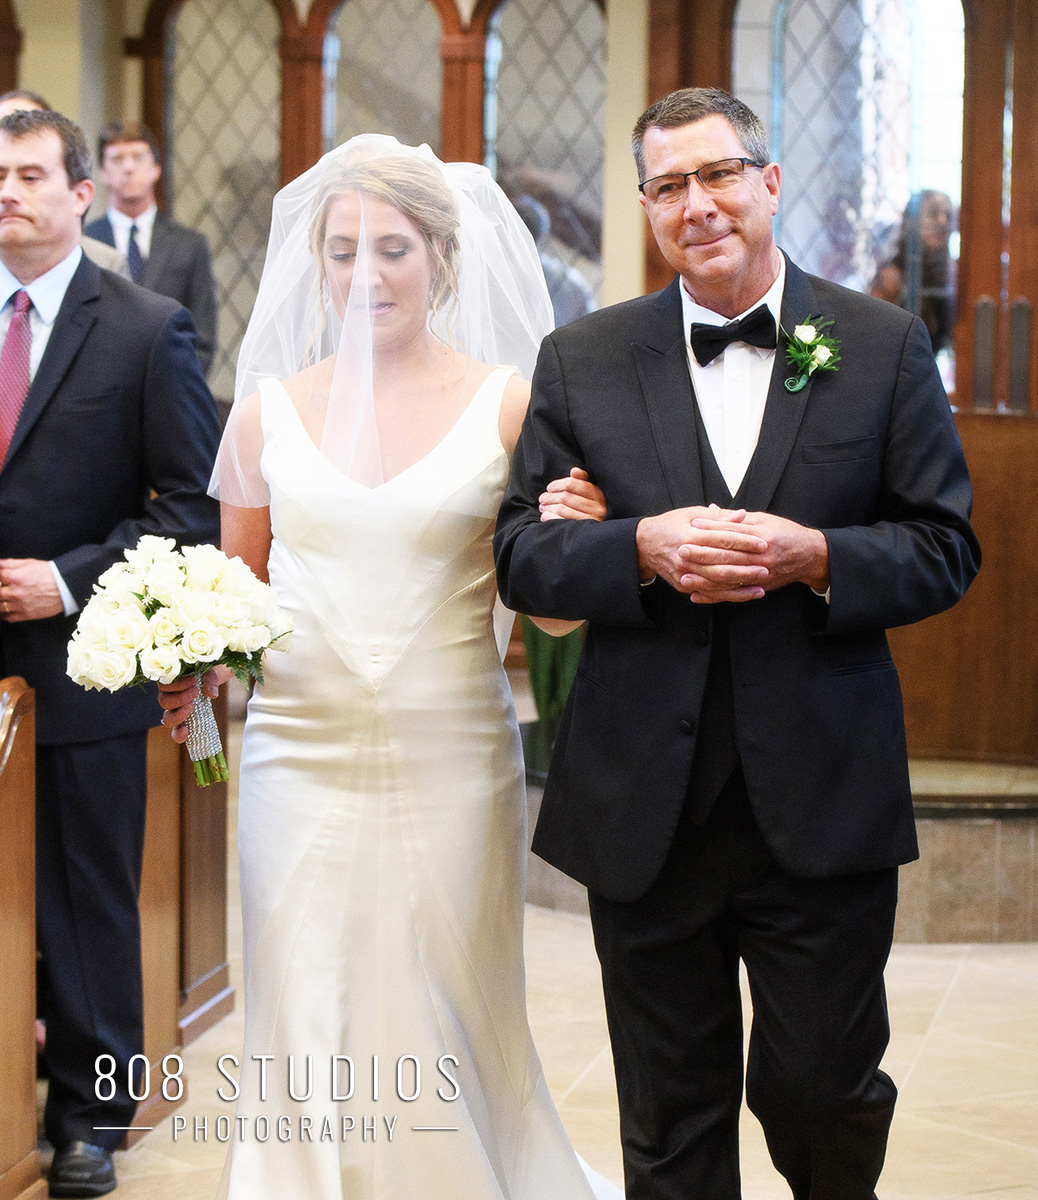 Dayton Wedding Photographer 808 STUDIOS 361_6333 copy